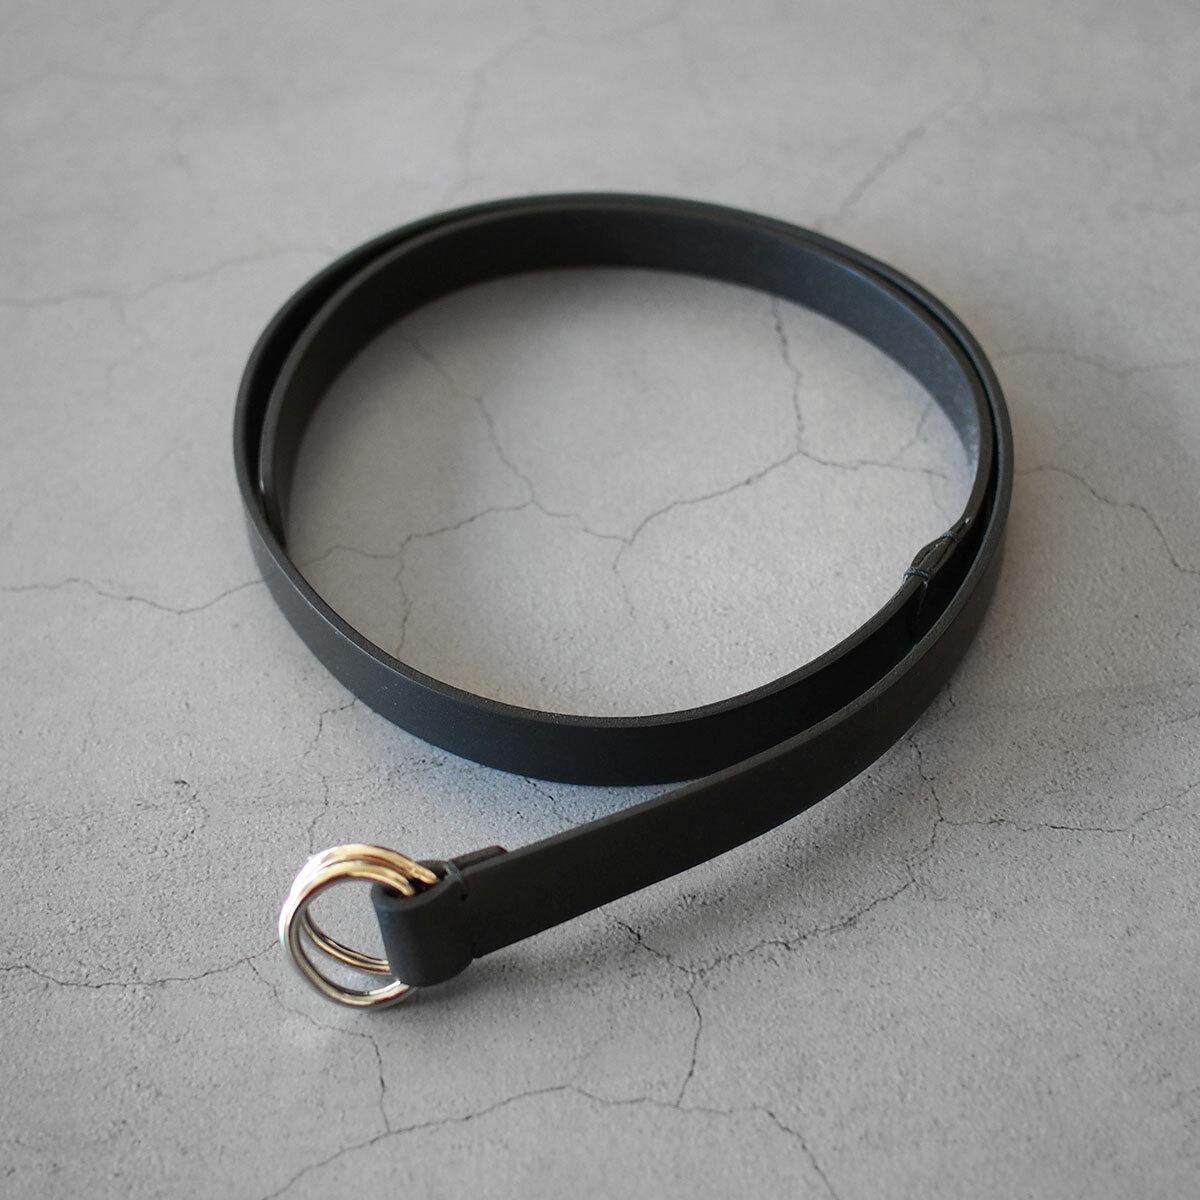 Aeta OVAL RING BELT BLACK